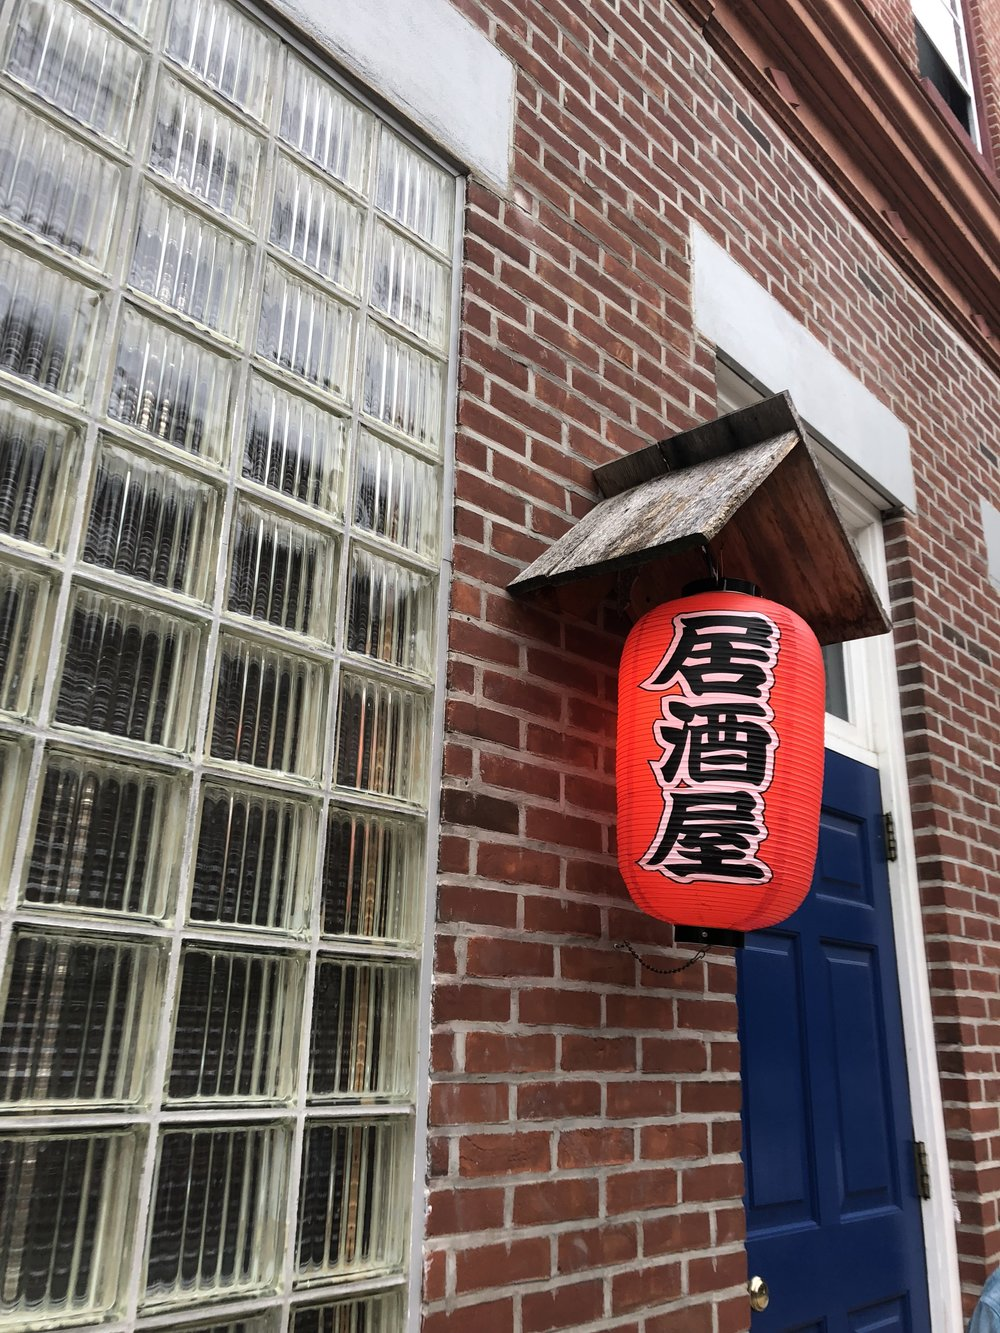 Lantern & Blue Door Entrance to Royal Izakaya